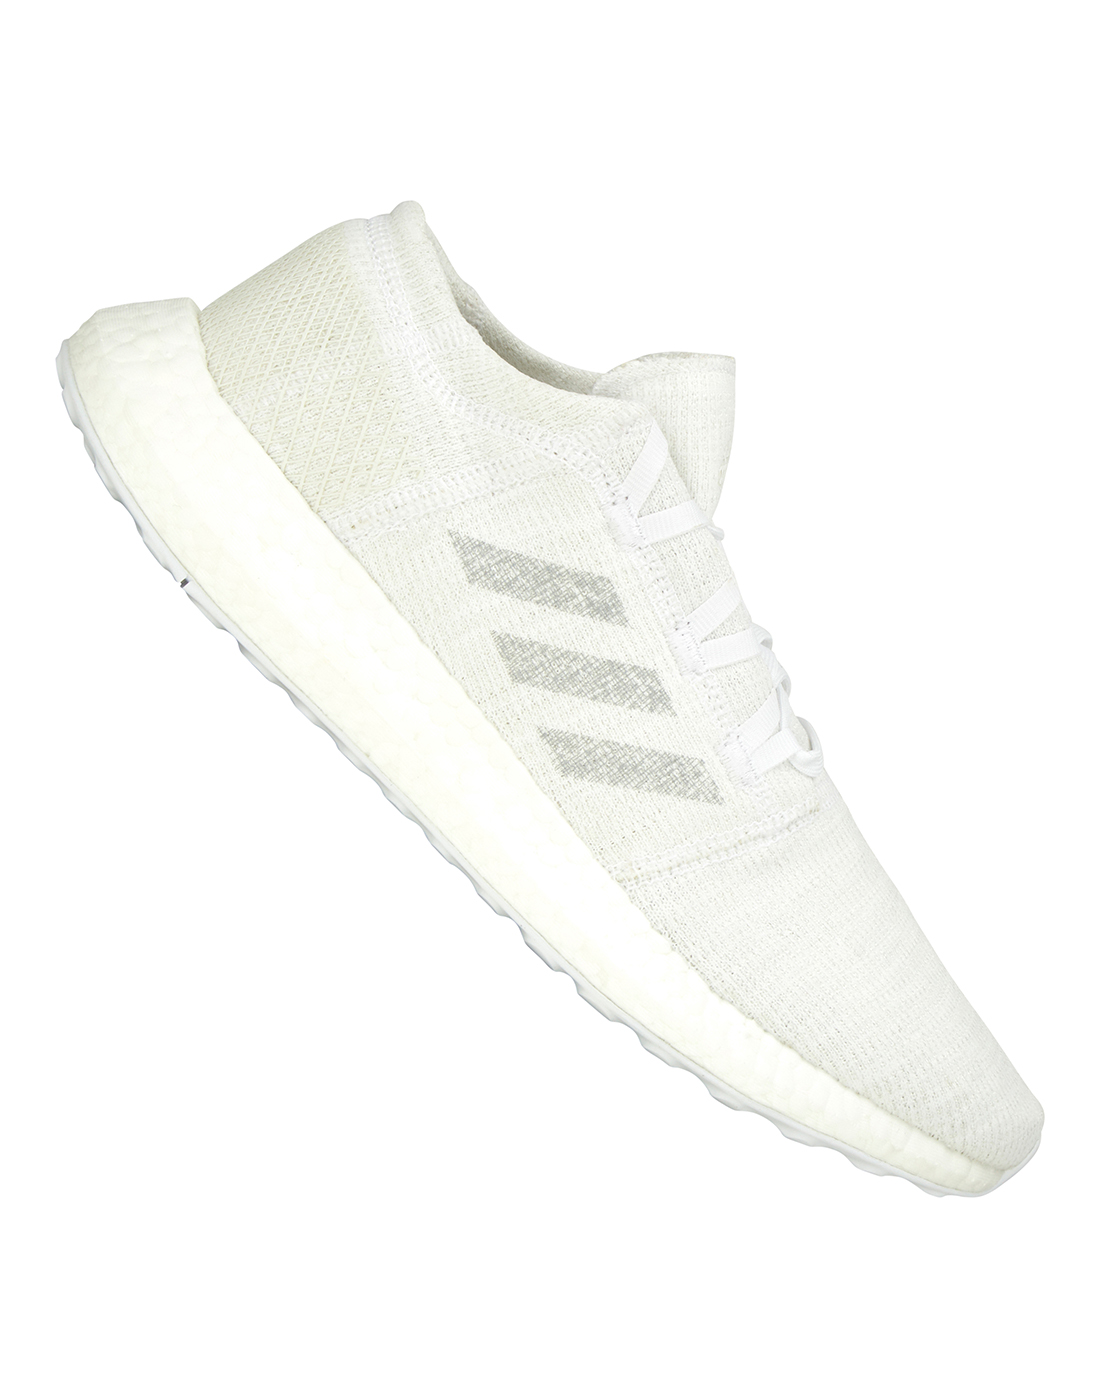 eb506eed16d3c Men s White adidas Pureboost Go